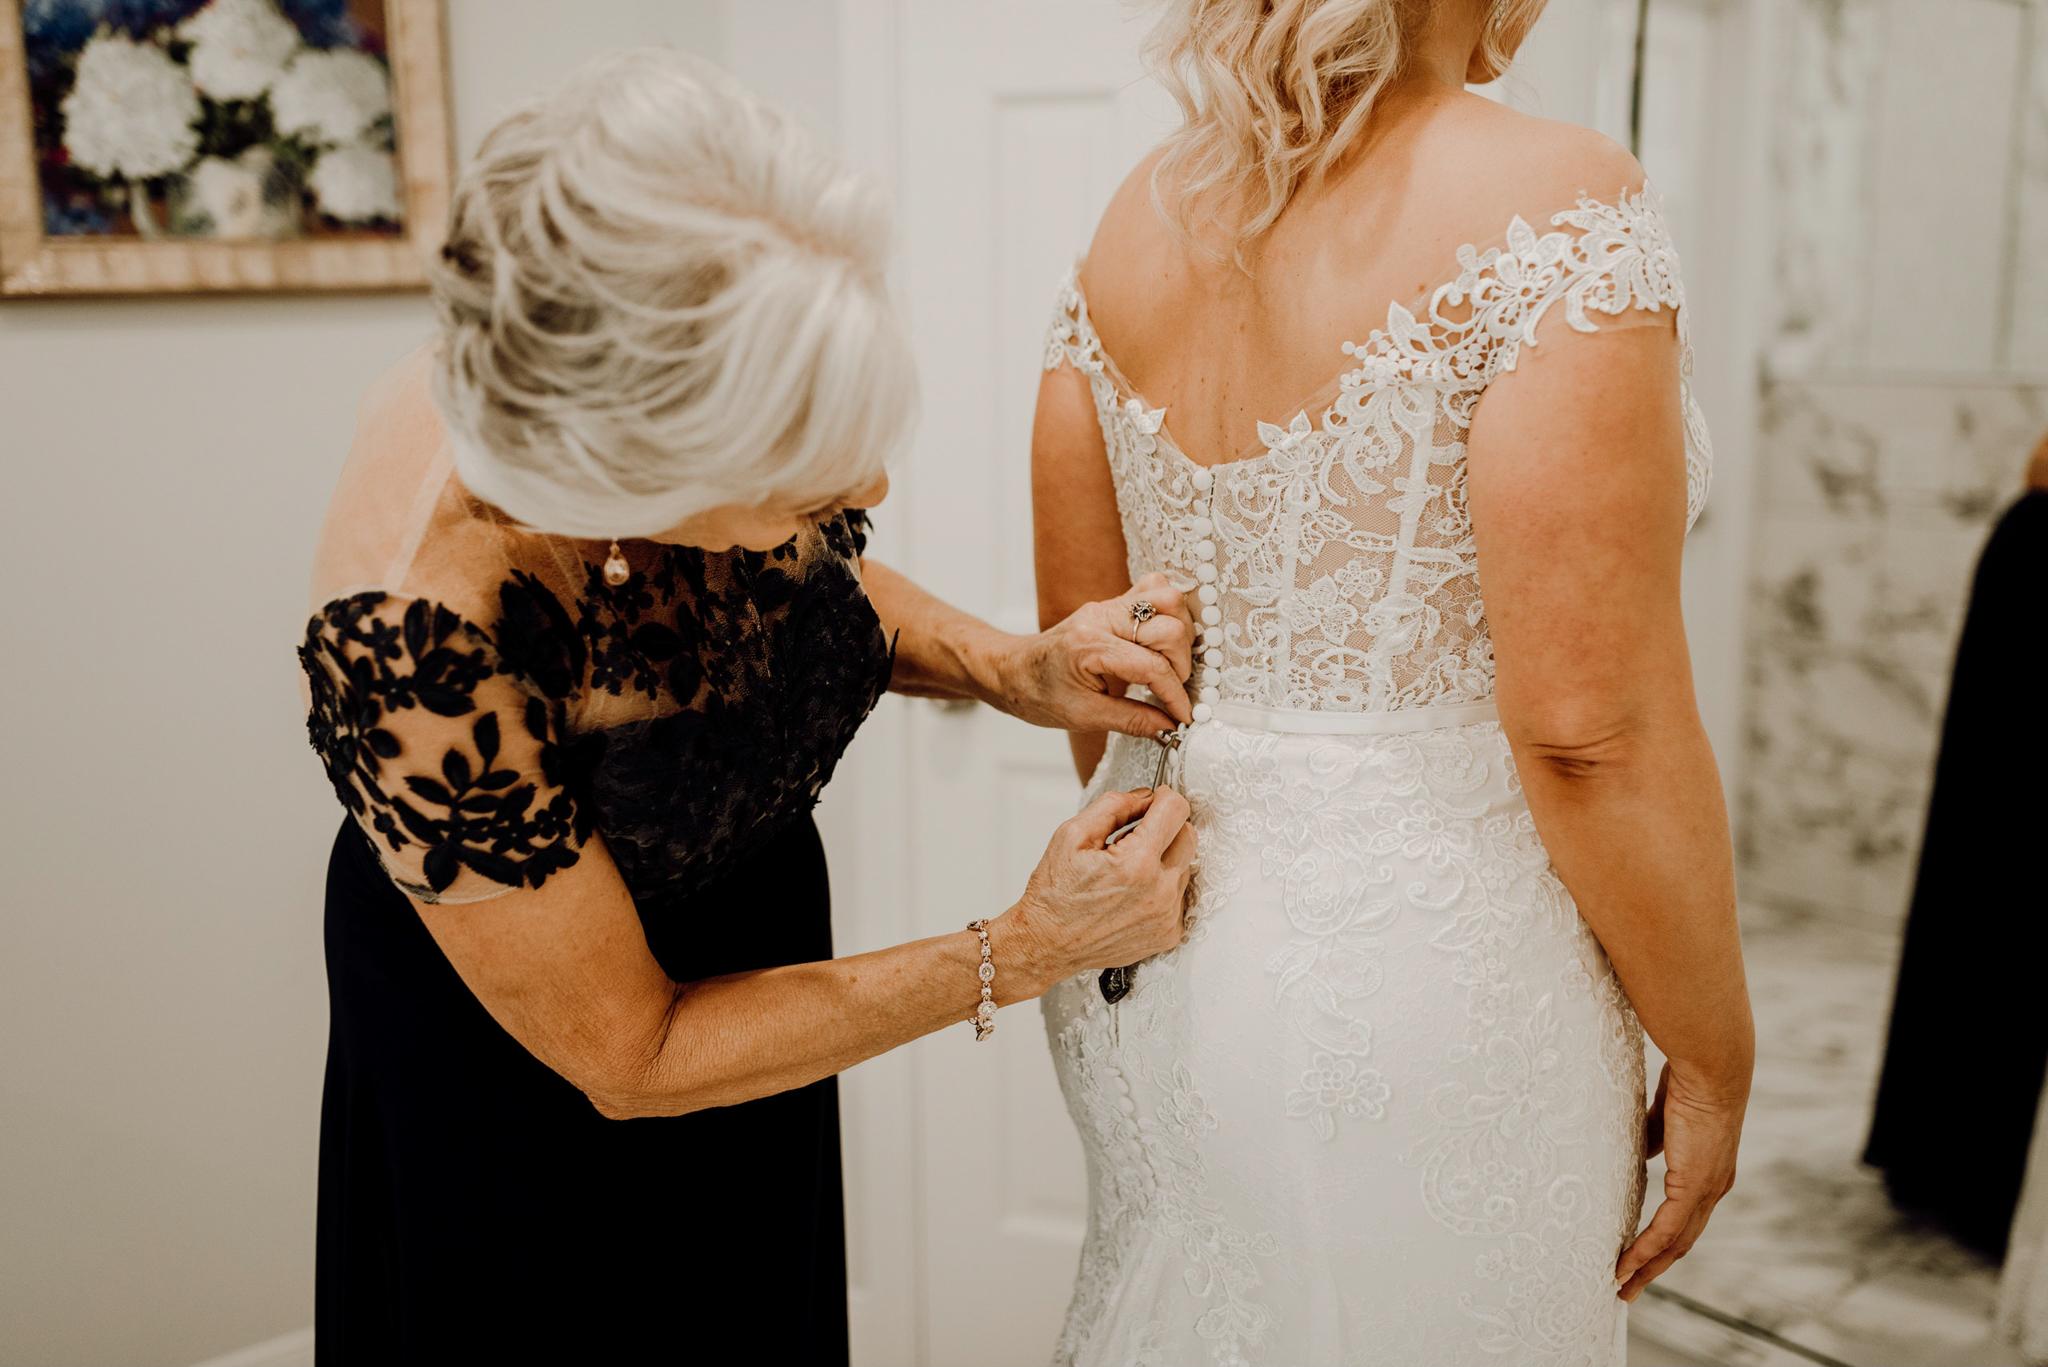 Houston Wedding Photographer-Intimate Texas Backyard Wedding- Houston Wedding Photographer -Kristen Giles Photography-24.jpg